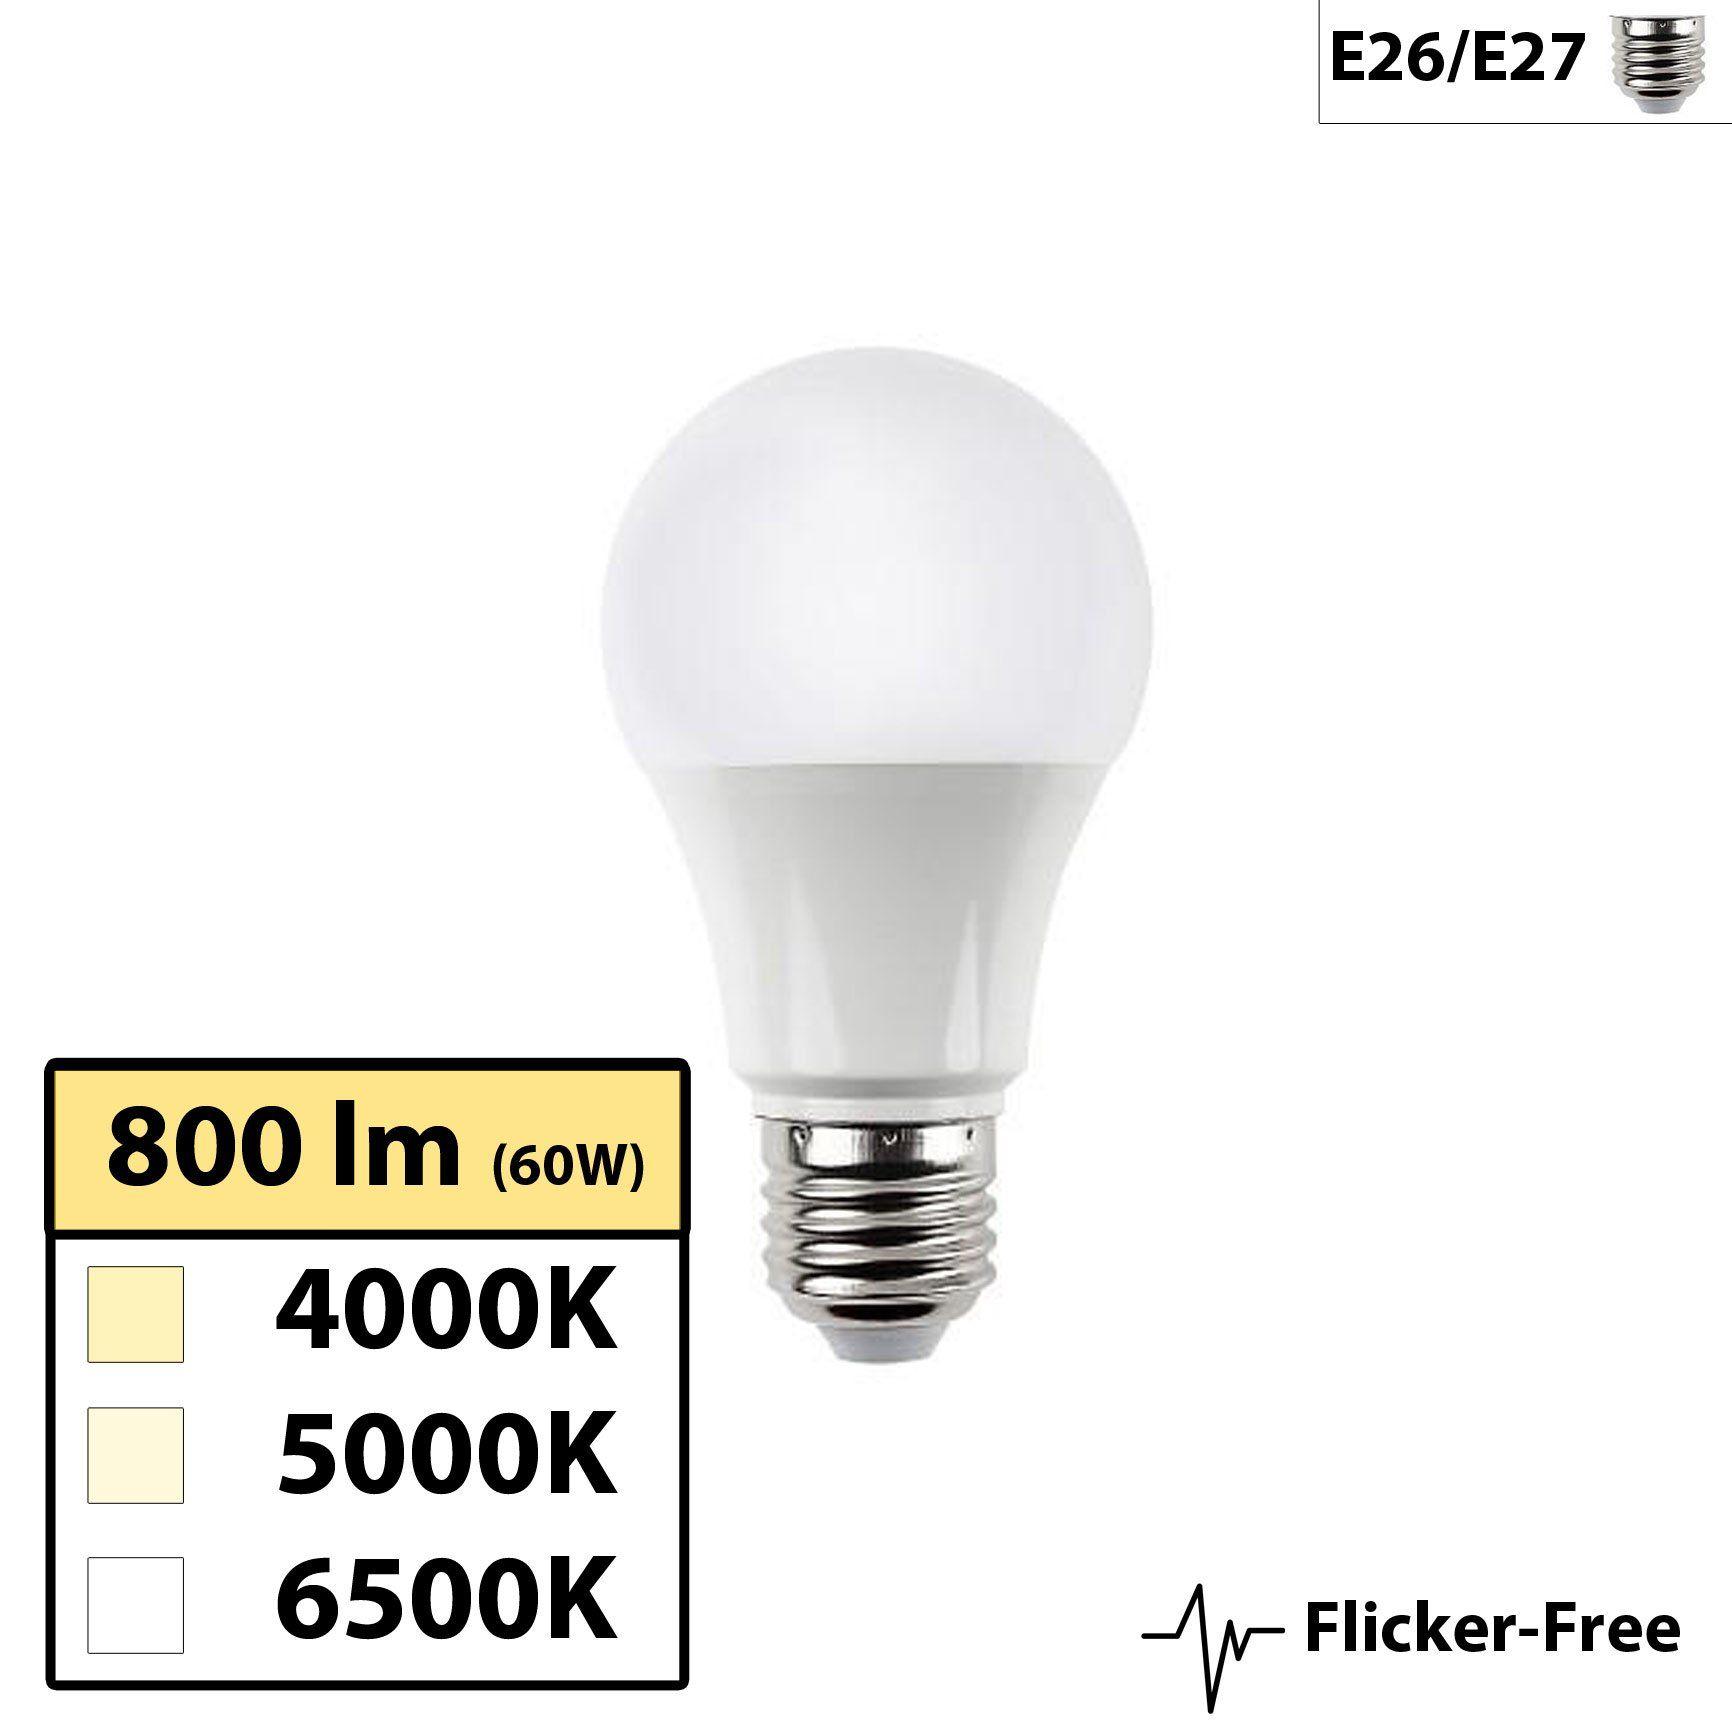 Centric Daylight Full Spectrum Flicker Free A19 10w Led Bulb Led Bulb Flicker Bulb